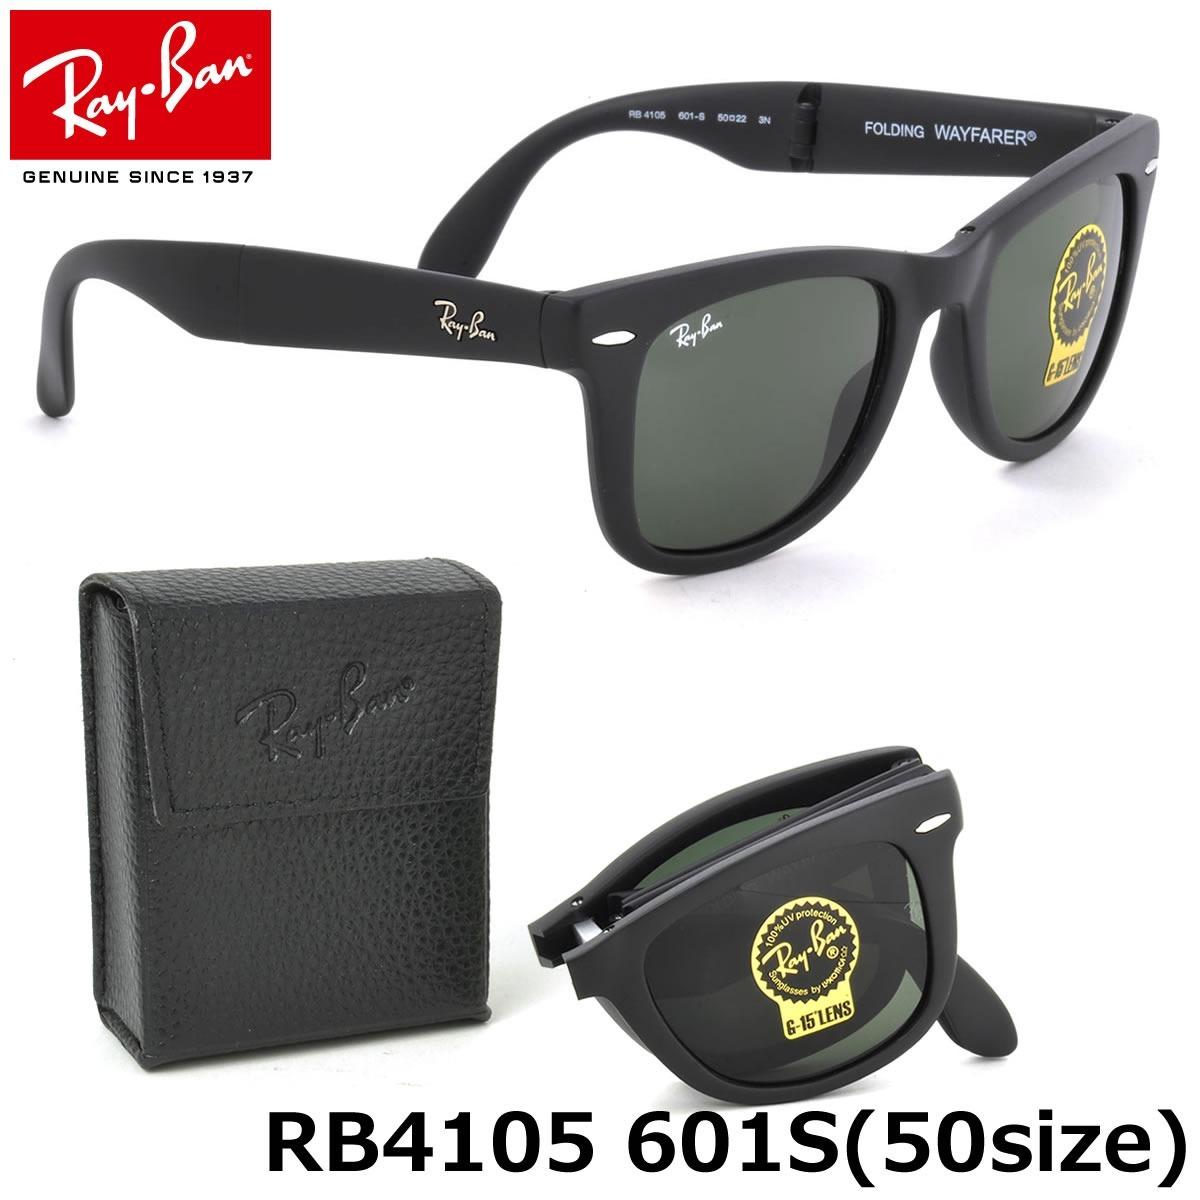 bb45fdf9b oculos de sol ray ban wayfarer dobravel folding rb4105 54mm. Carregando  zoom.